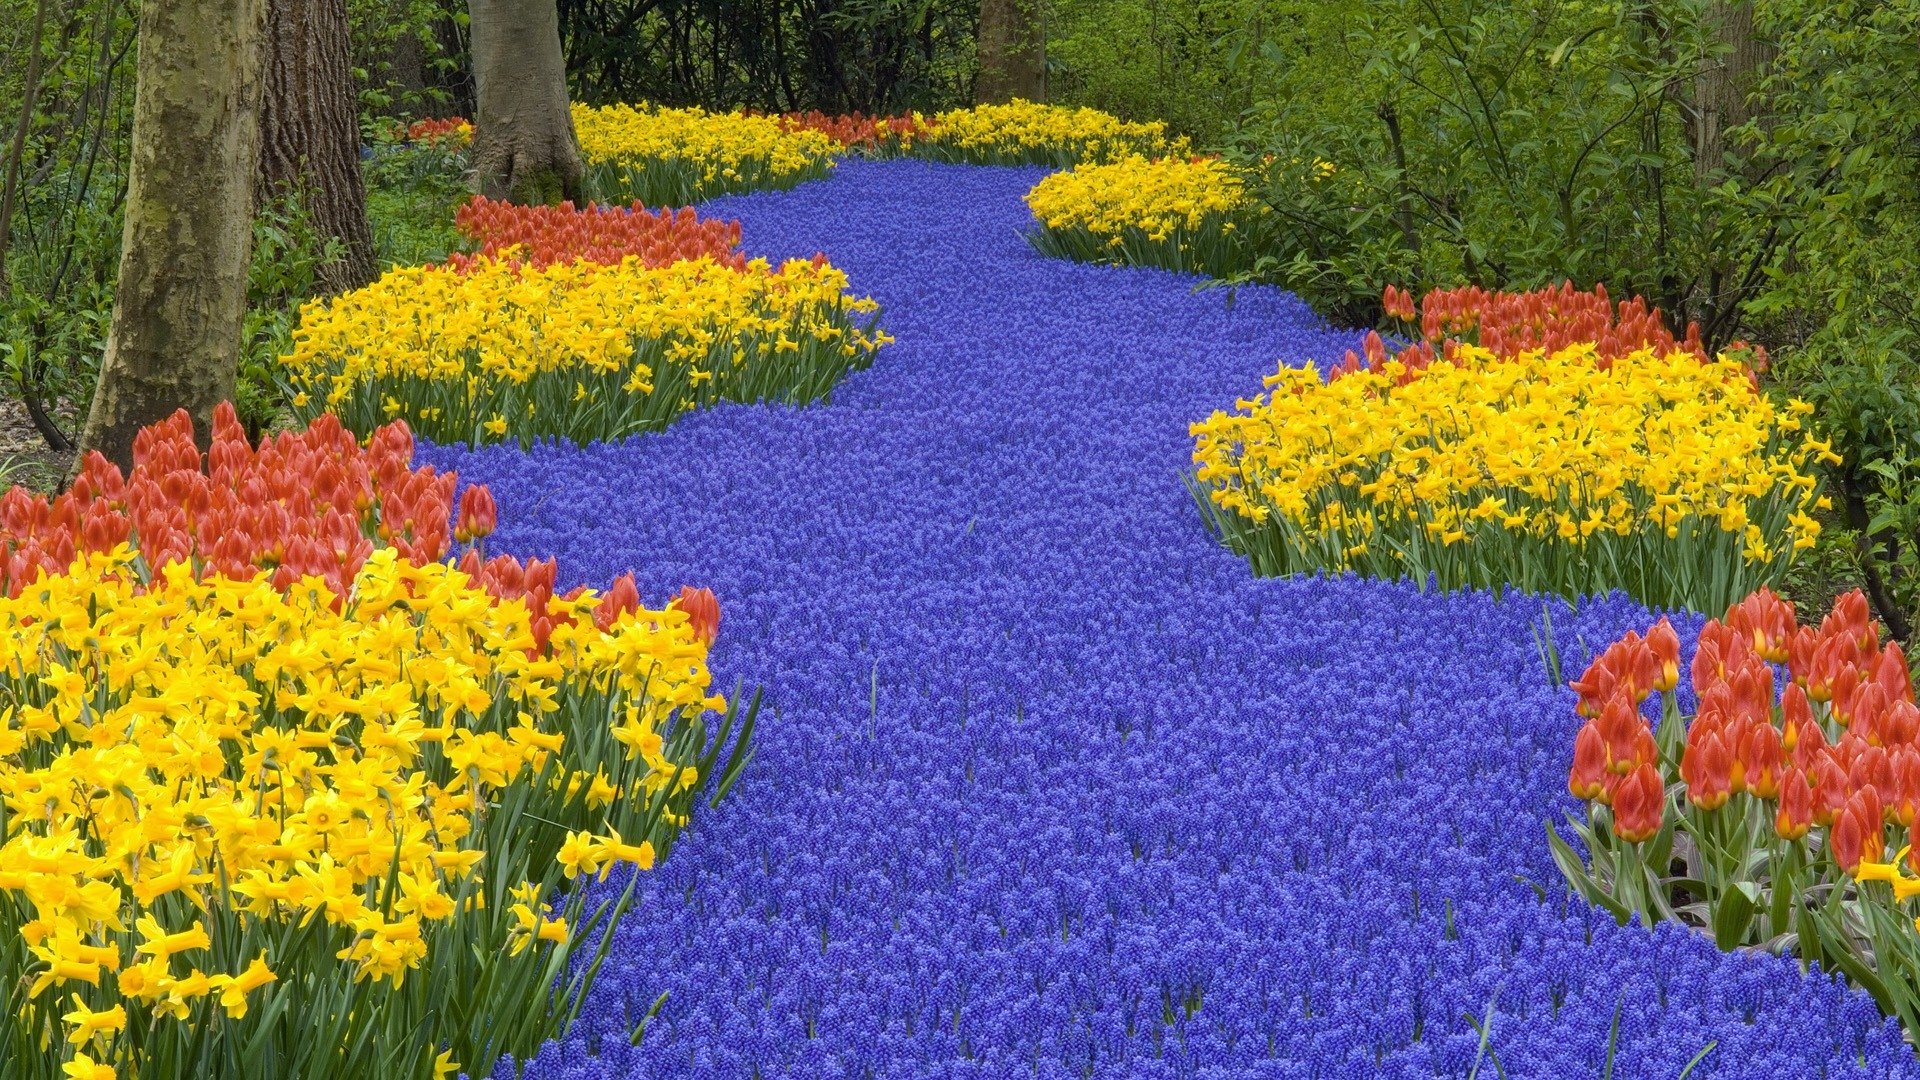 download wallpaper 1920x1080 daffodils, tulips, muscari, chamomile